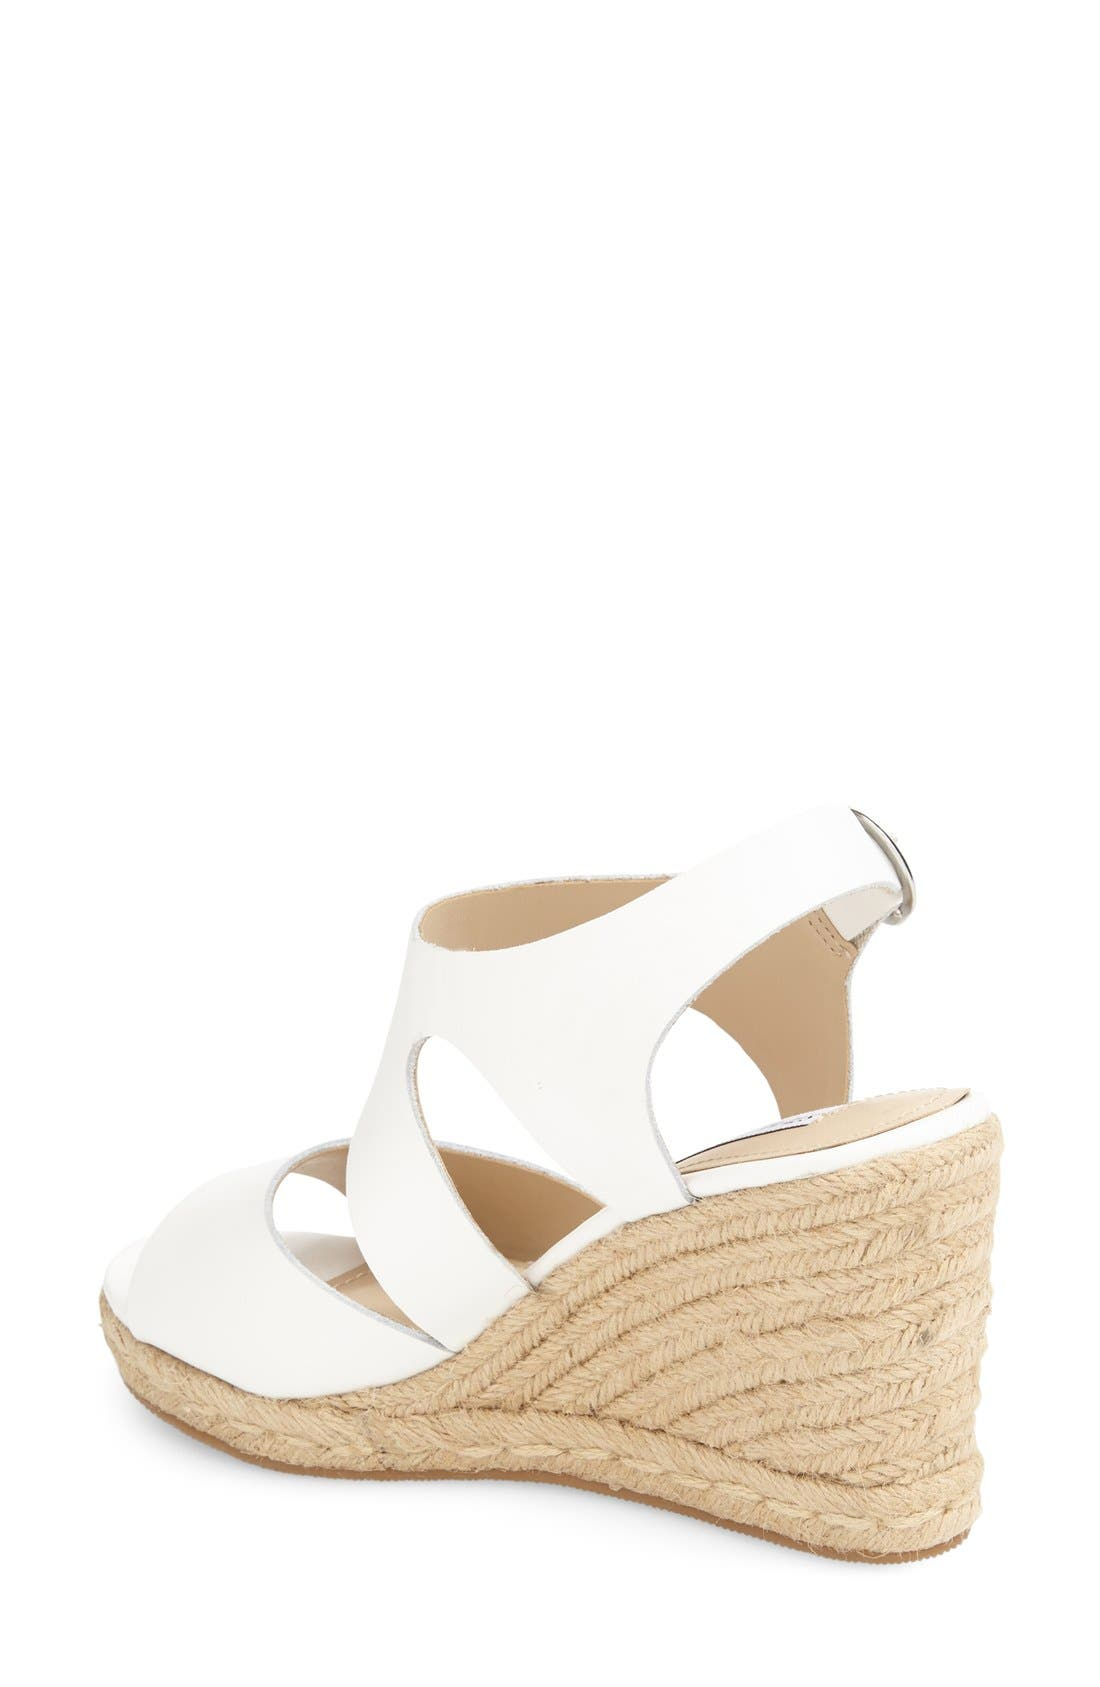 'Wavi' Espadrille Wedge Sandal,                             Alternate thumbnail 2, color,                             White Leather